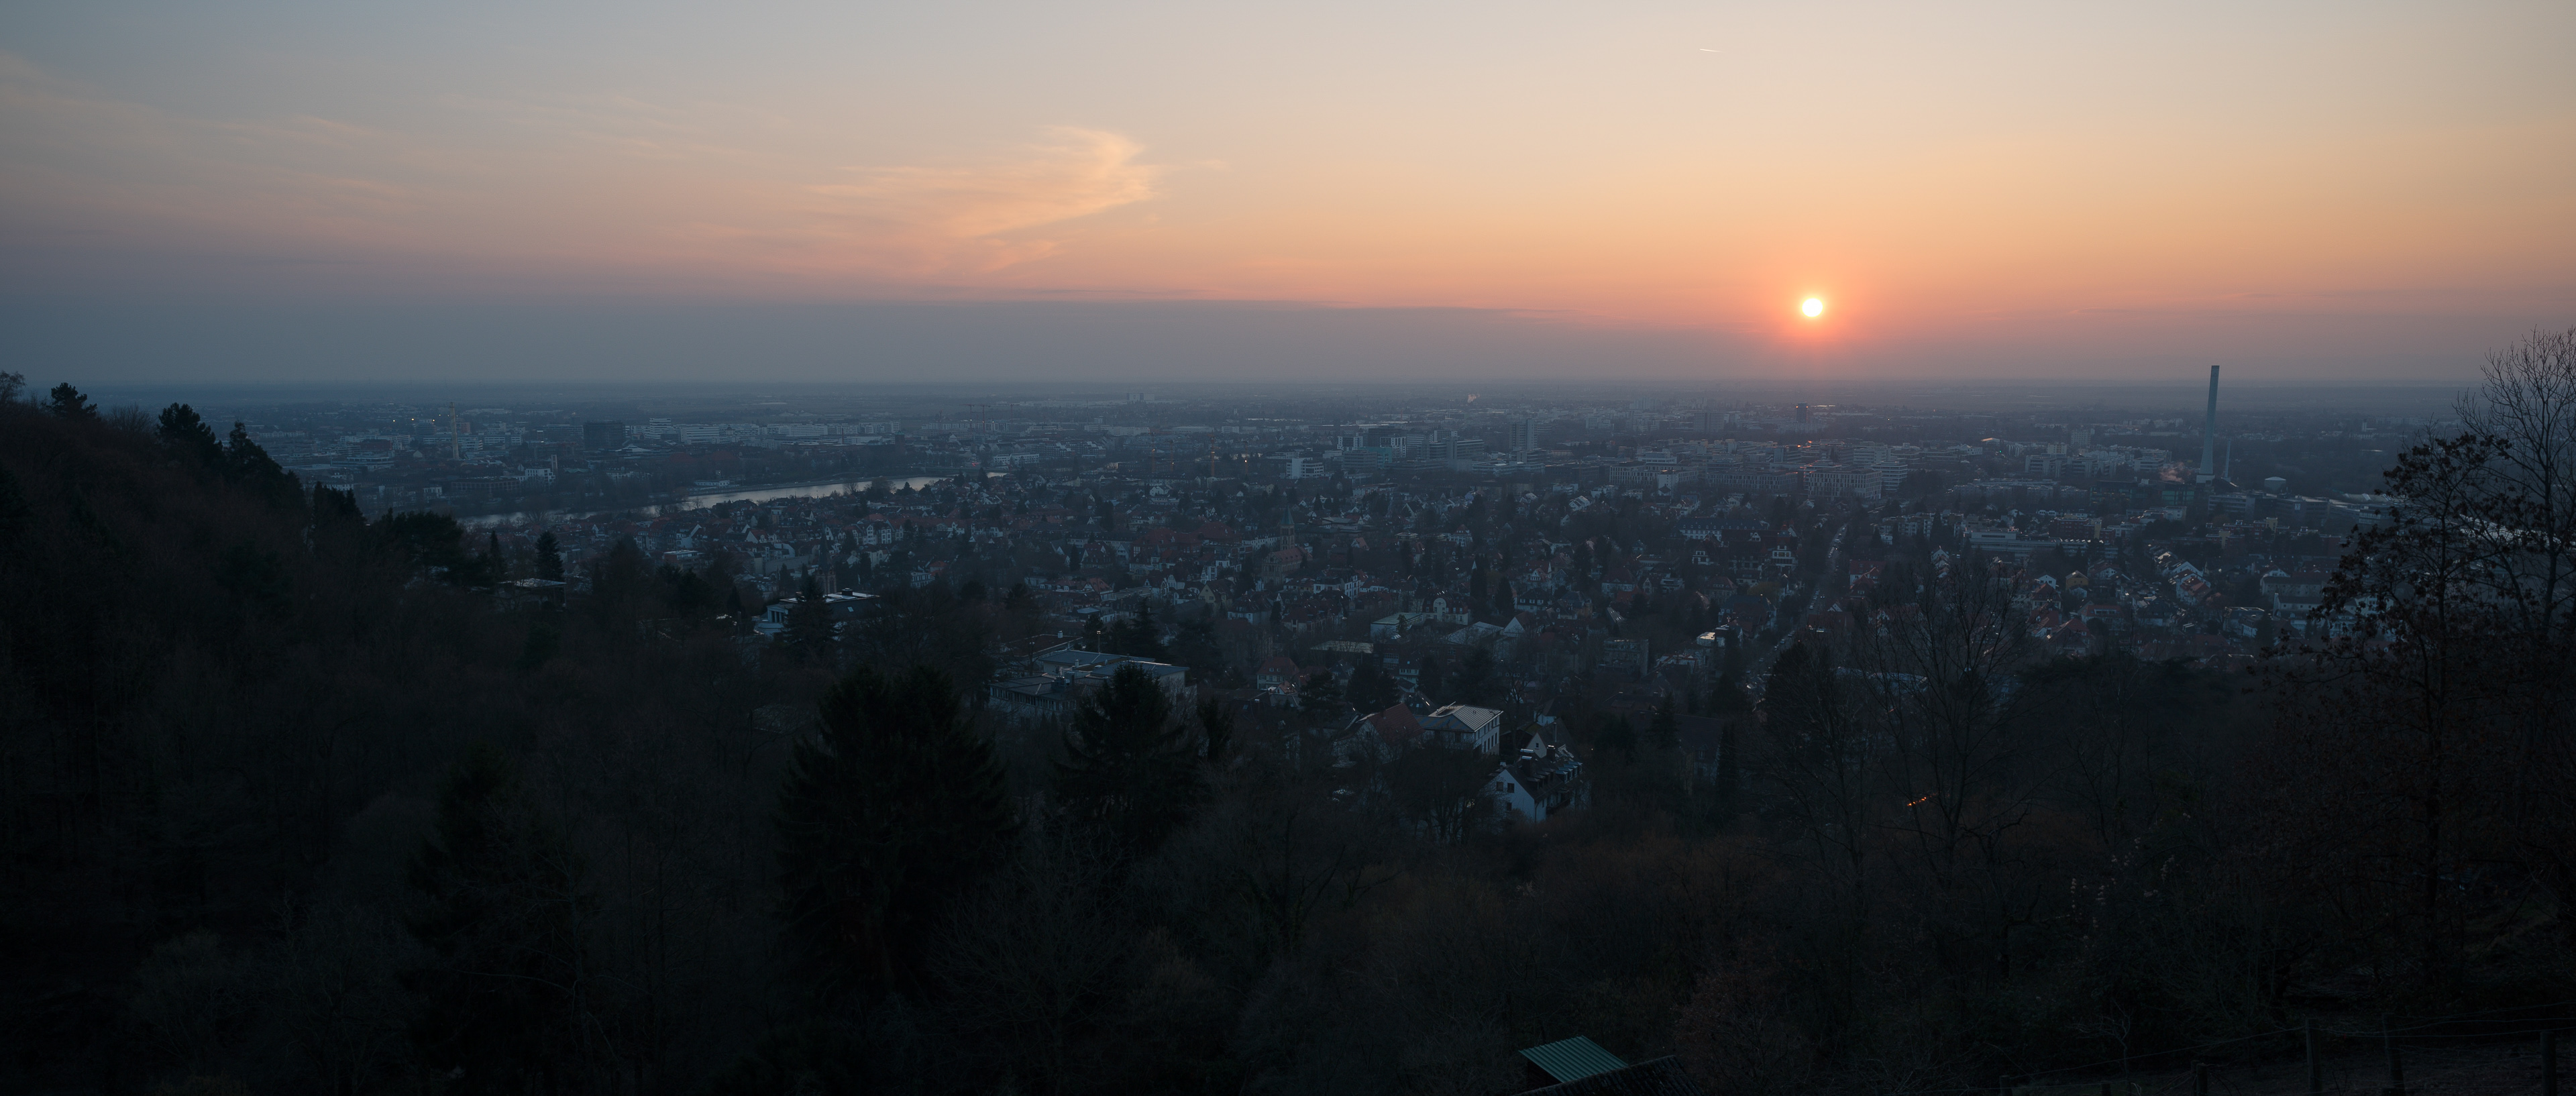 Irgendwo am Horizont: Das Café Botanik im Neuenheimer Feld. Foto: Nicolaus Niebylski